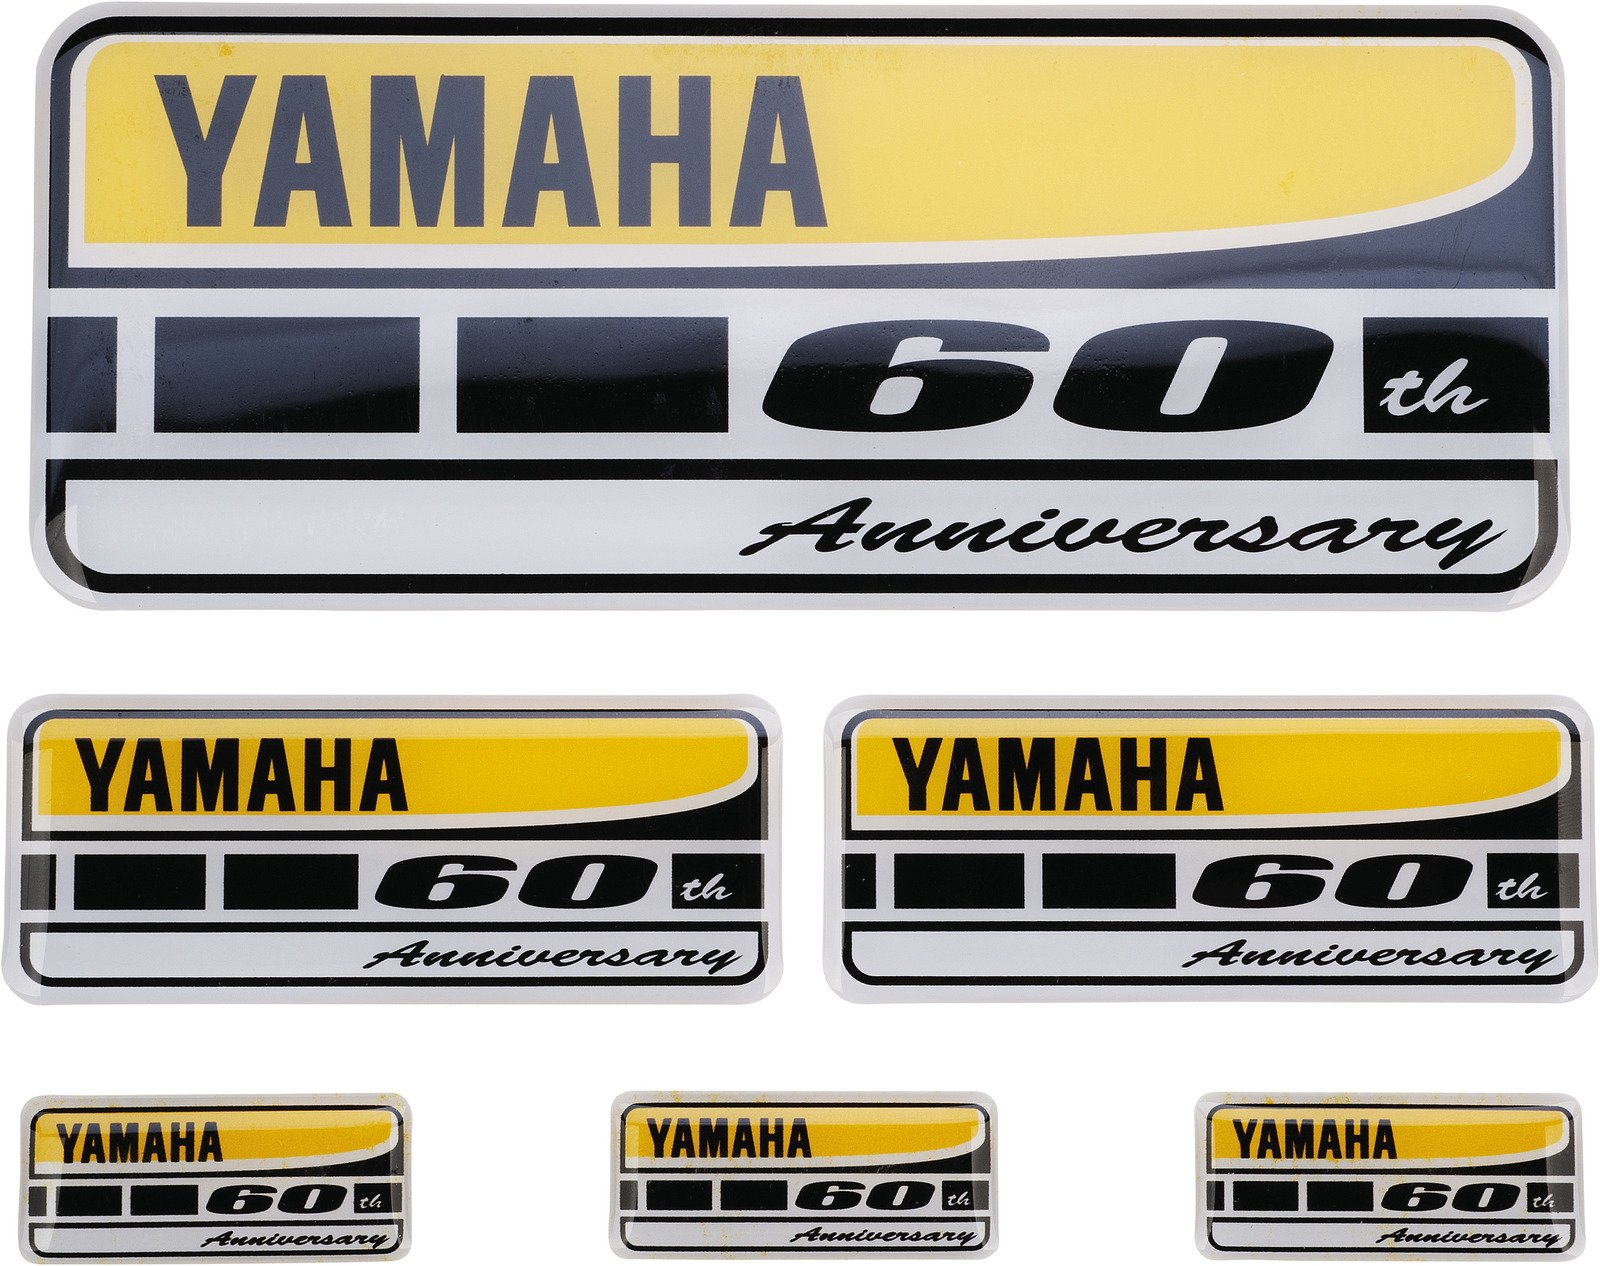 YAMAHA Sticker - Set '60th Anniversary', 6 pcs./ 3 sizes, retail packing, OEM # N15TK009Y200, 80127